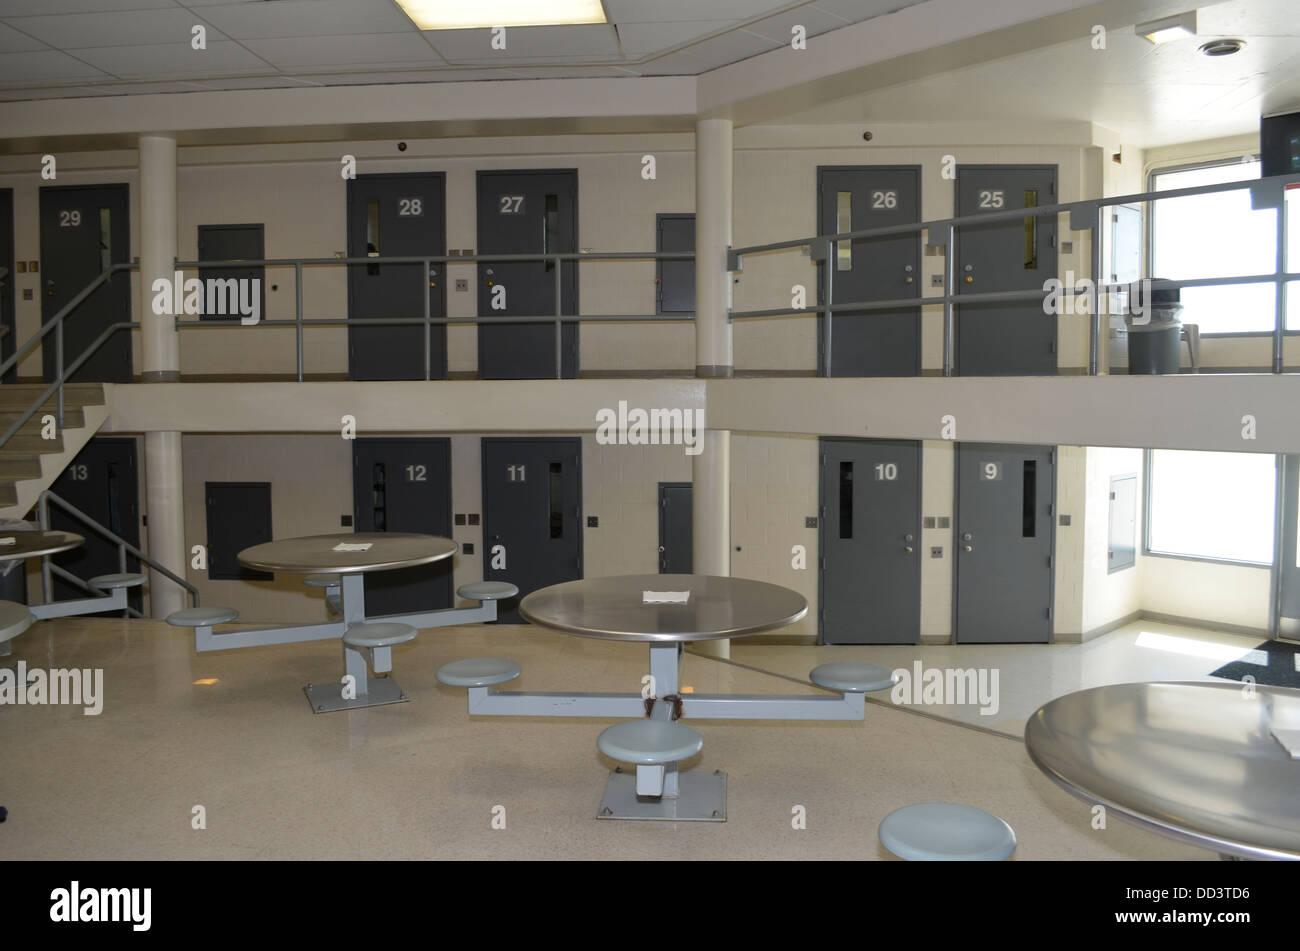 Lincoln Prison Cell Stock Photos  Lincoln Prison Cell Stock - Office furniture lincoln ne